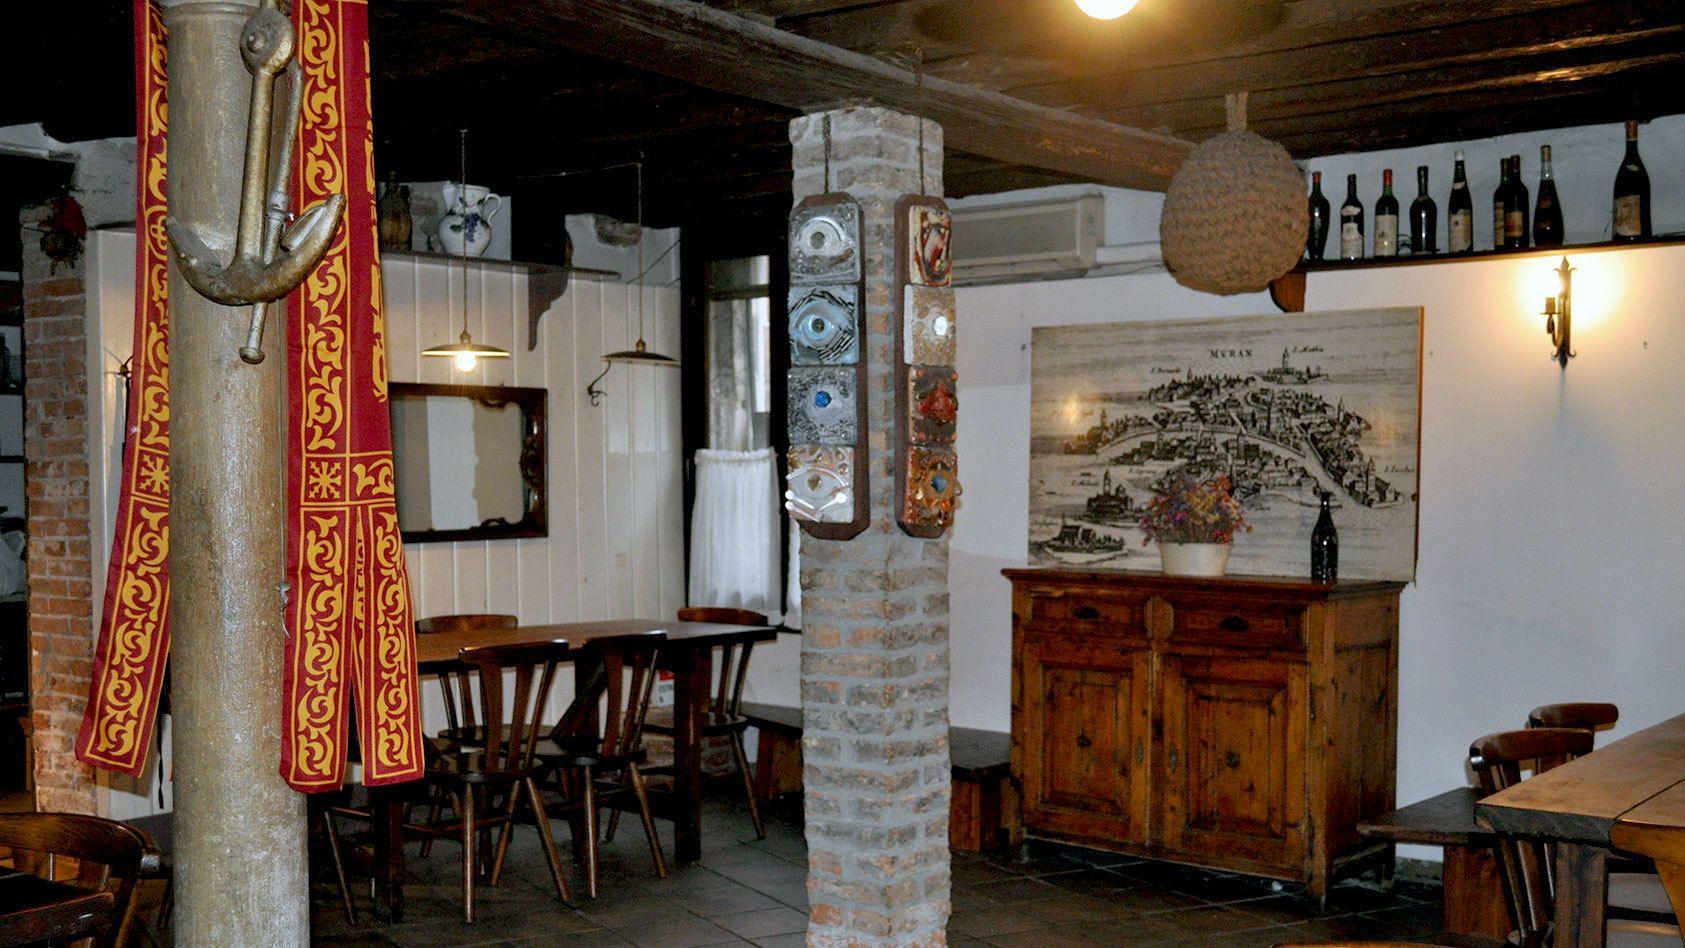 Interior of the bar in Venice